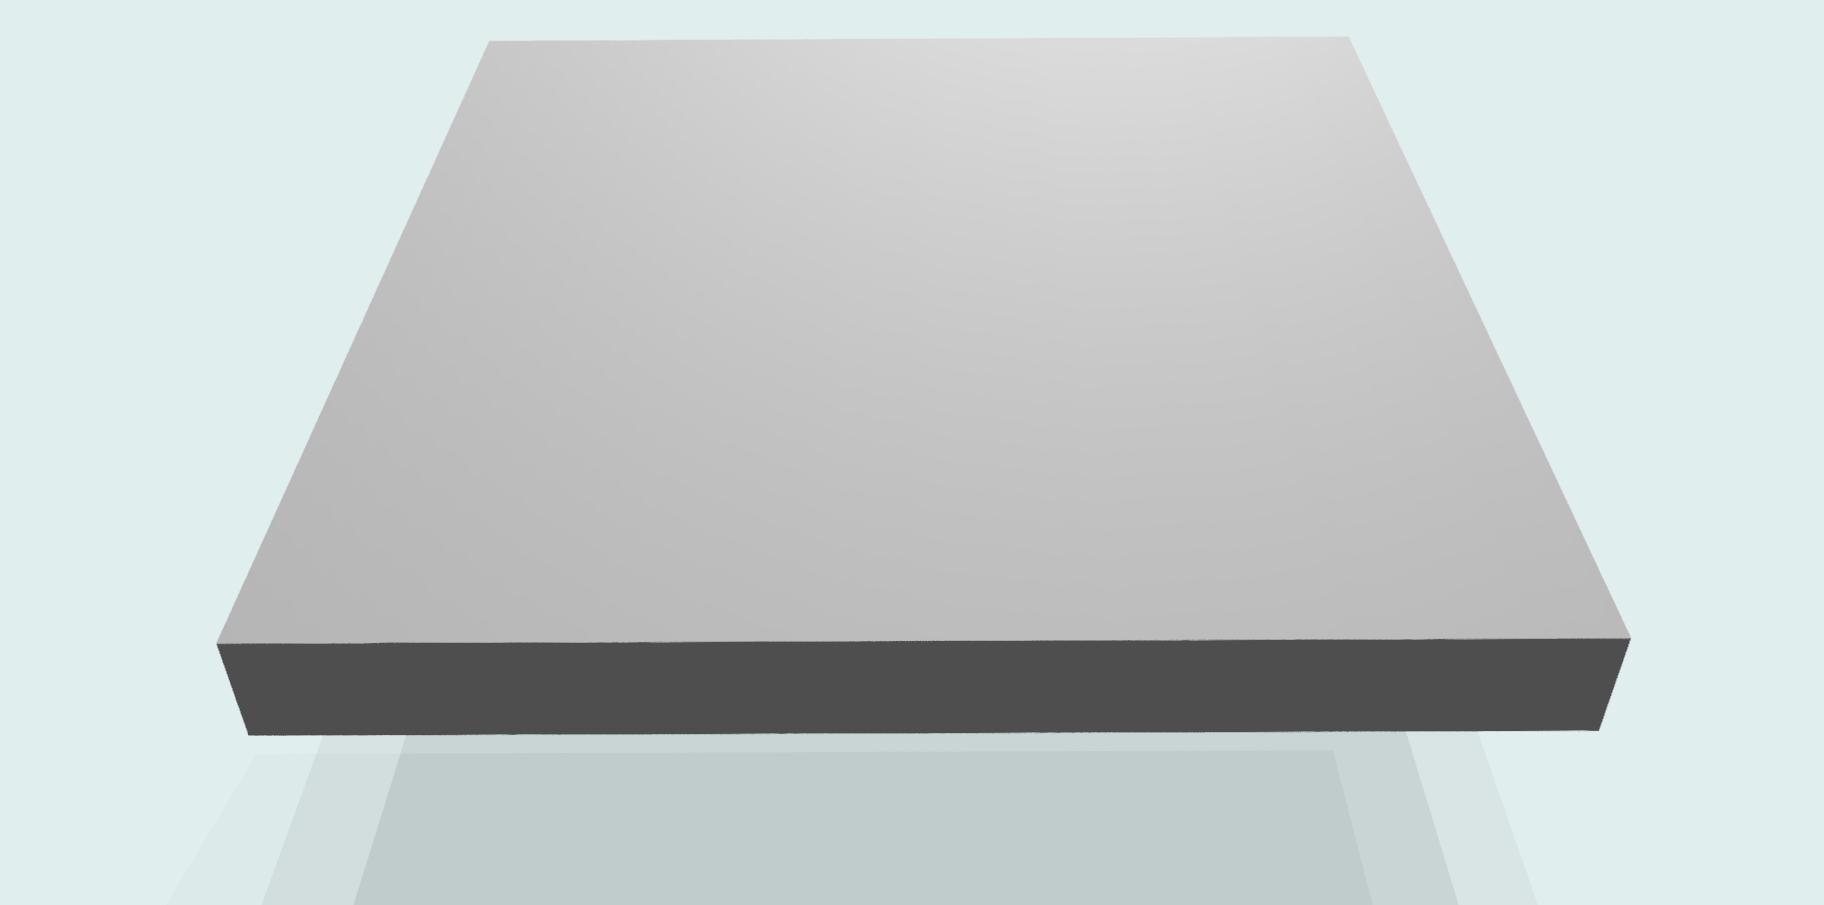 Tischplatte 19 mm melaminharzbeschichtet RAL 7035, grau